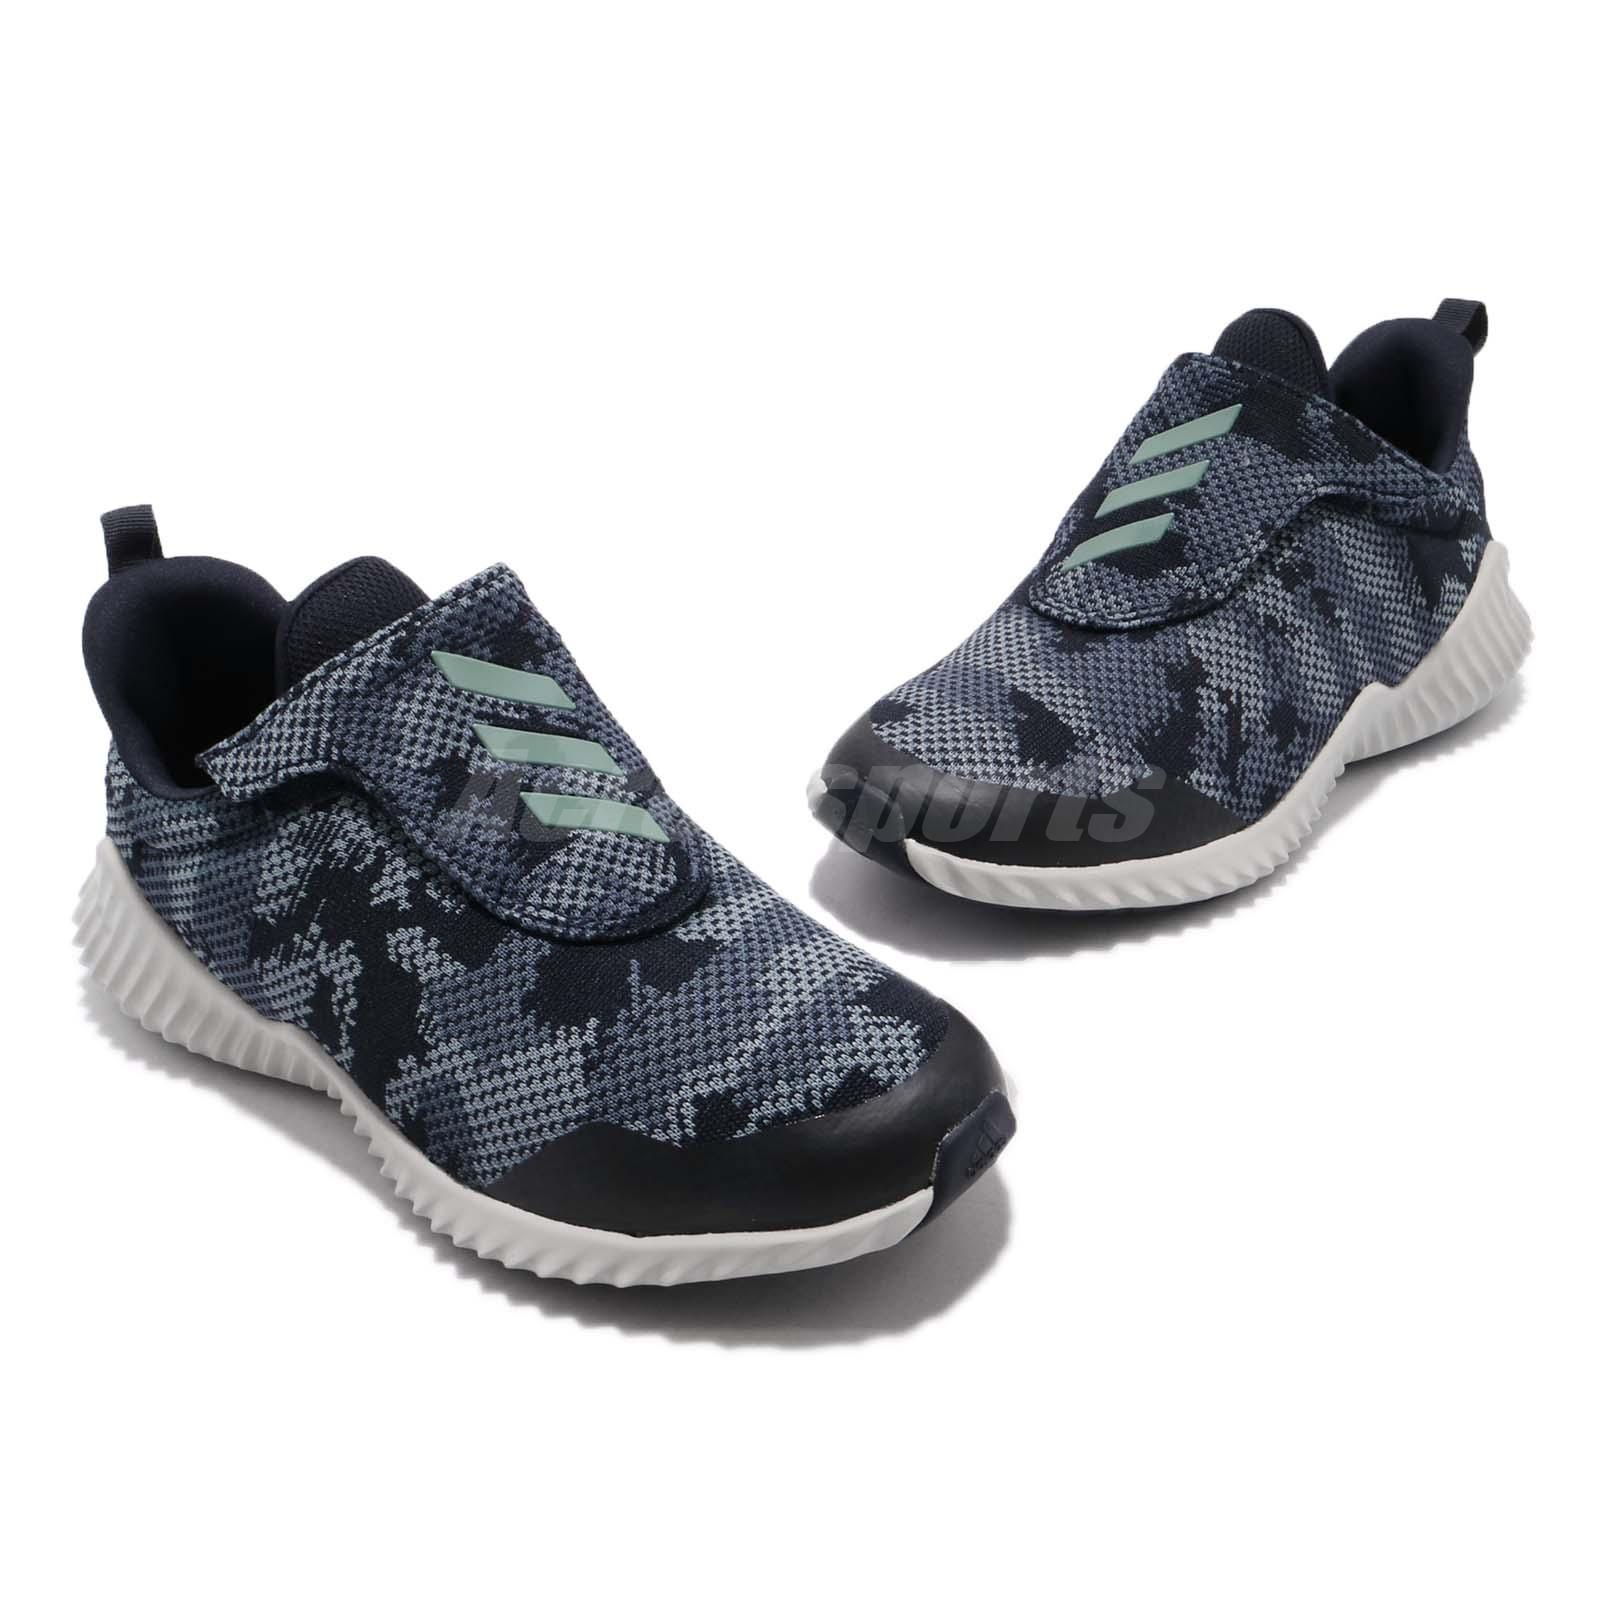 factory authentic 211eb 5c77c adidas FortaRun AC K Blue Grey Navy Kid Preschool Slip On Sh